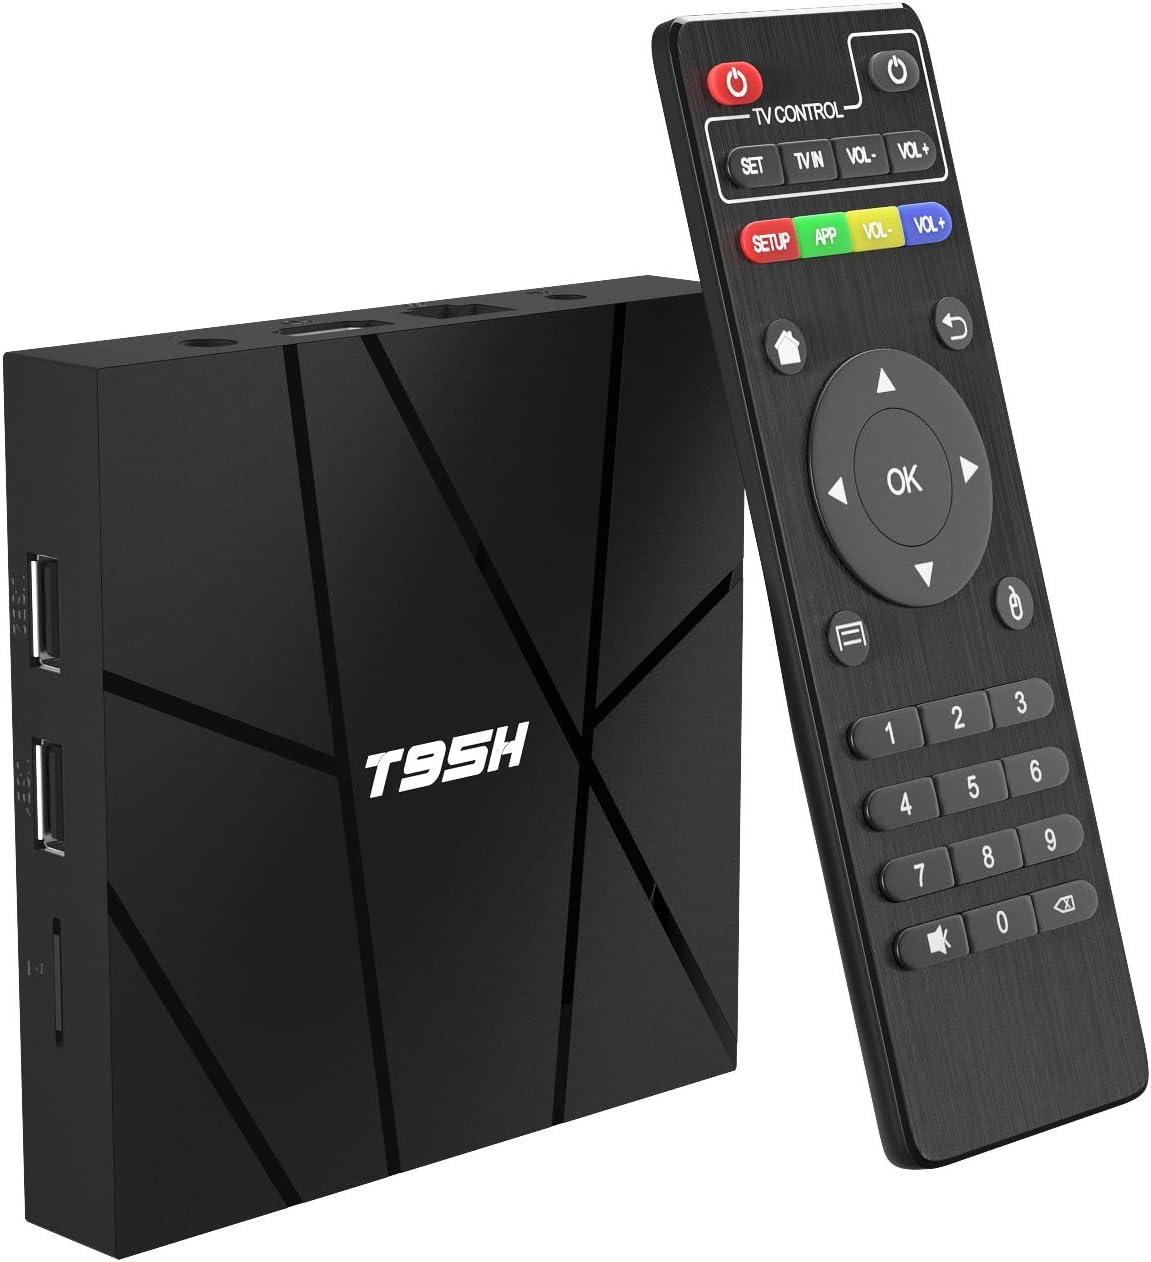 10 // 100M Ethernet 2.4G WiFi etc. H.265 3D T95H Allwinner H616 Quad-Core 2020 6K TV Box con 64bit Android 10.0 TV Box 2GB RAM 16GB ROM Smart TV Box